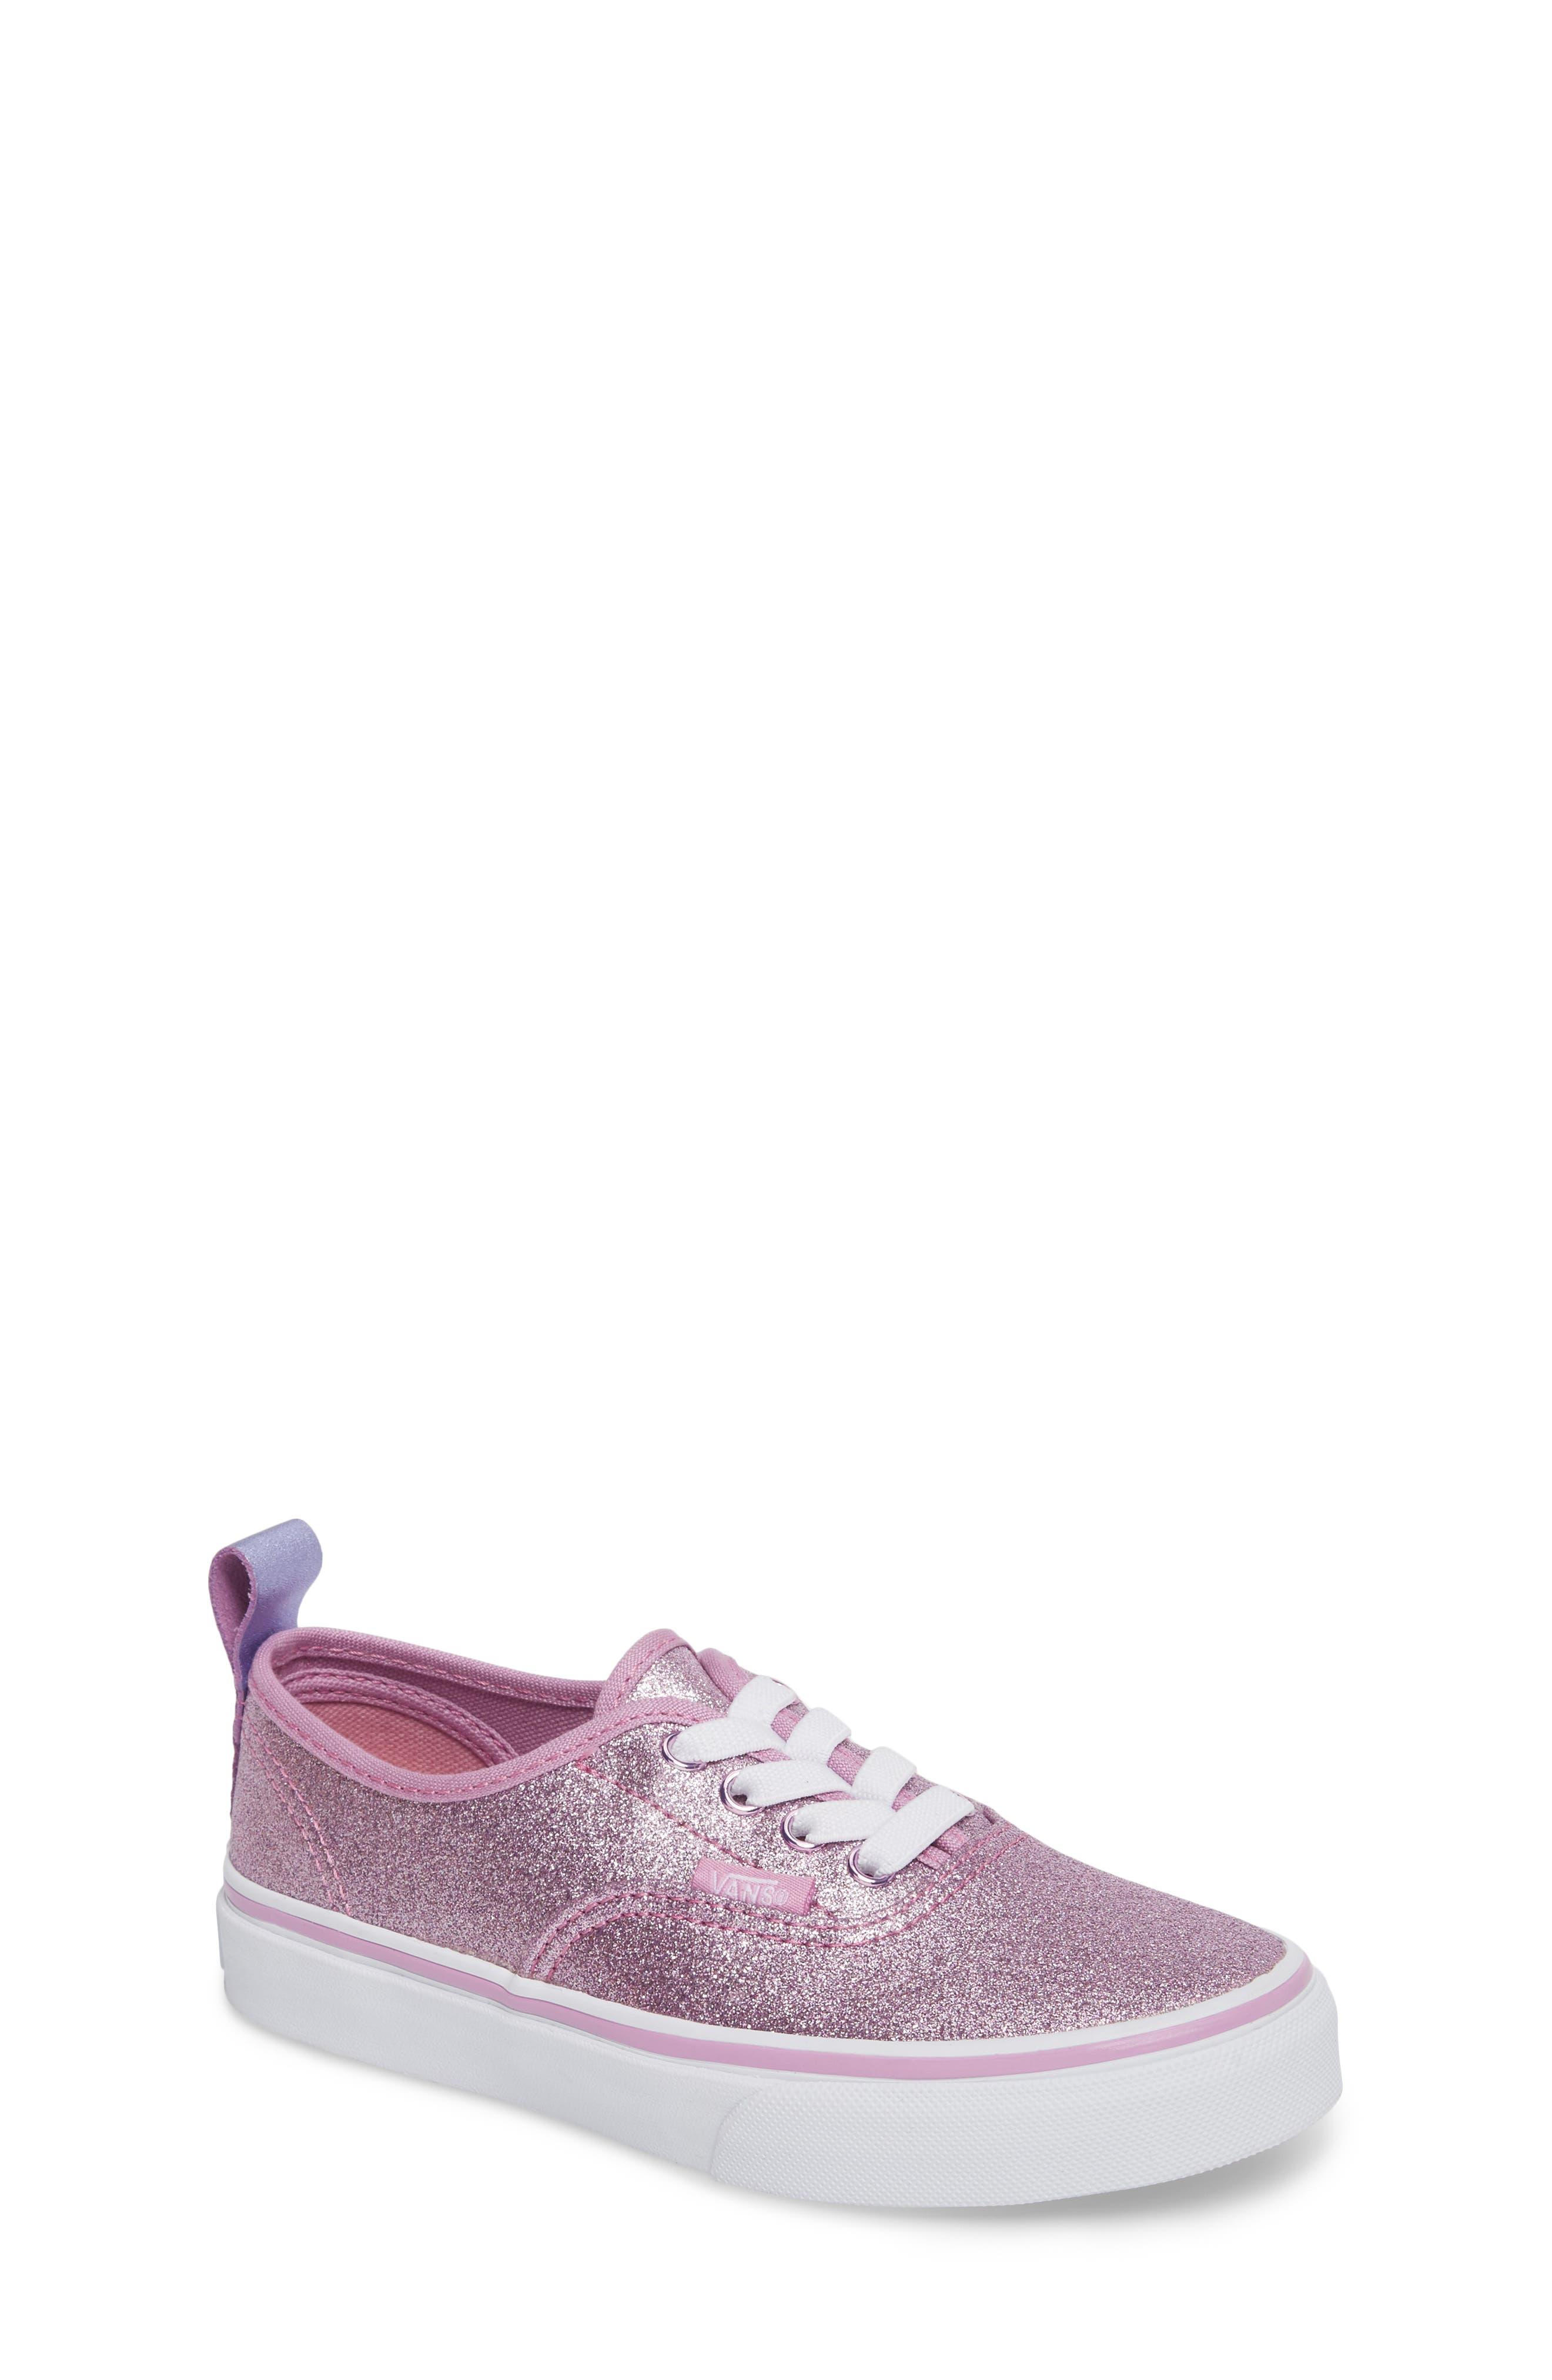 Alternate Image 1 Selected - Vans Glitter Authentic Elastic Lace Sneaker (Baby, Walker, Toddler, Little Kid & Big Kid)